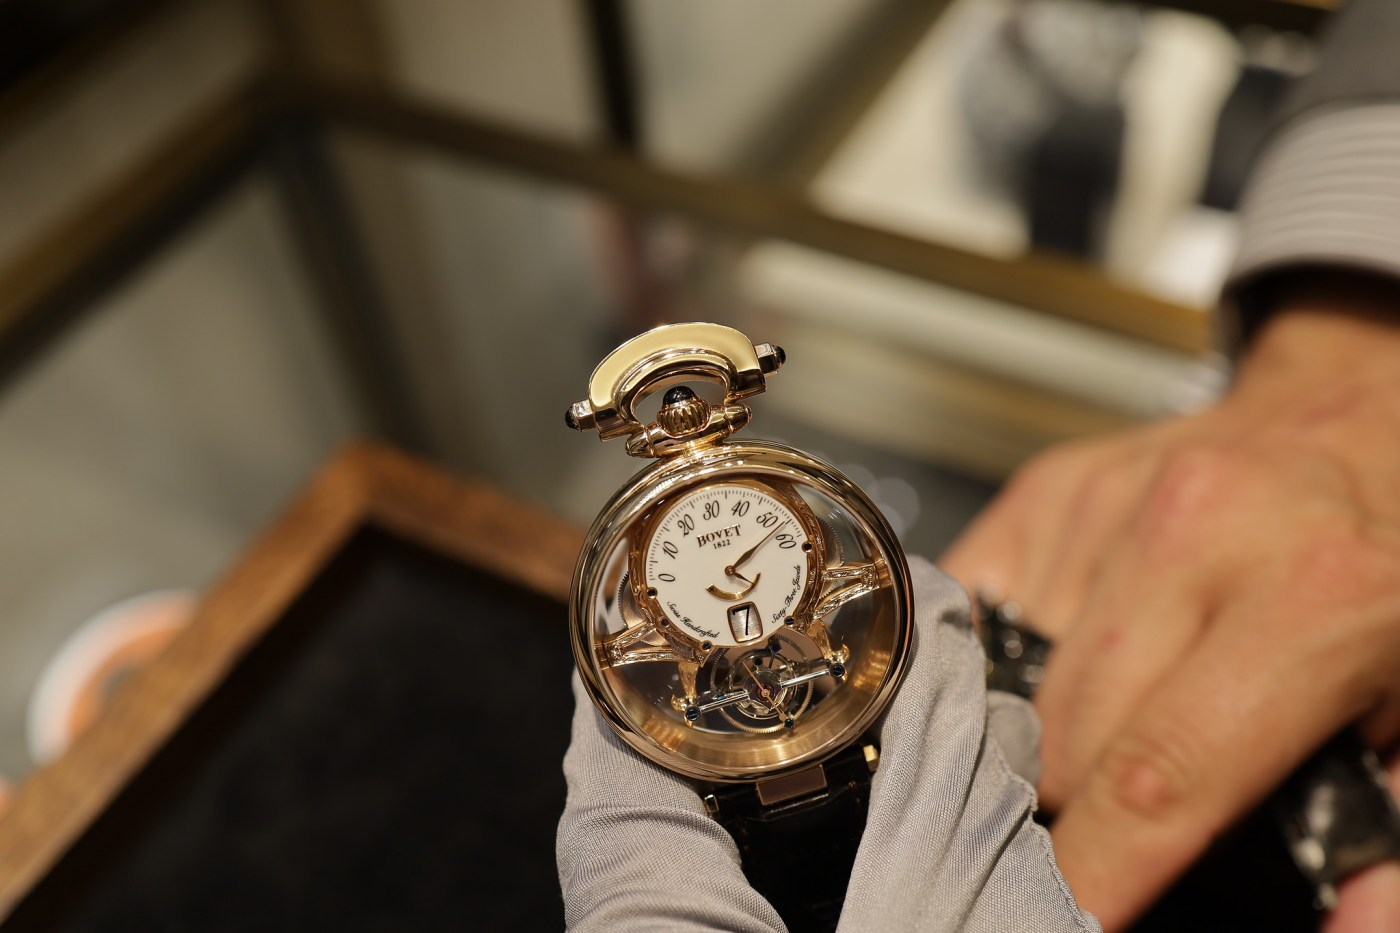 Bovet reversible tourbillon wristwatch/pocketwatch